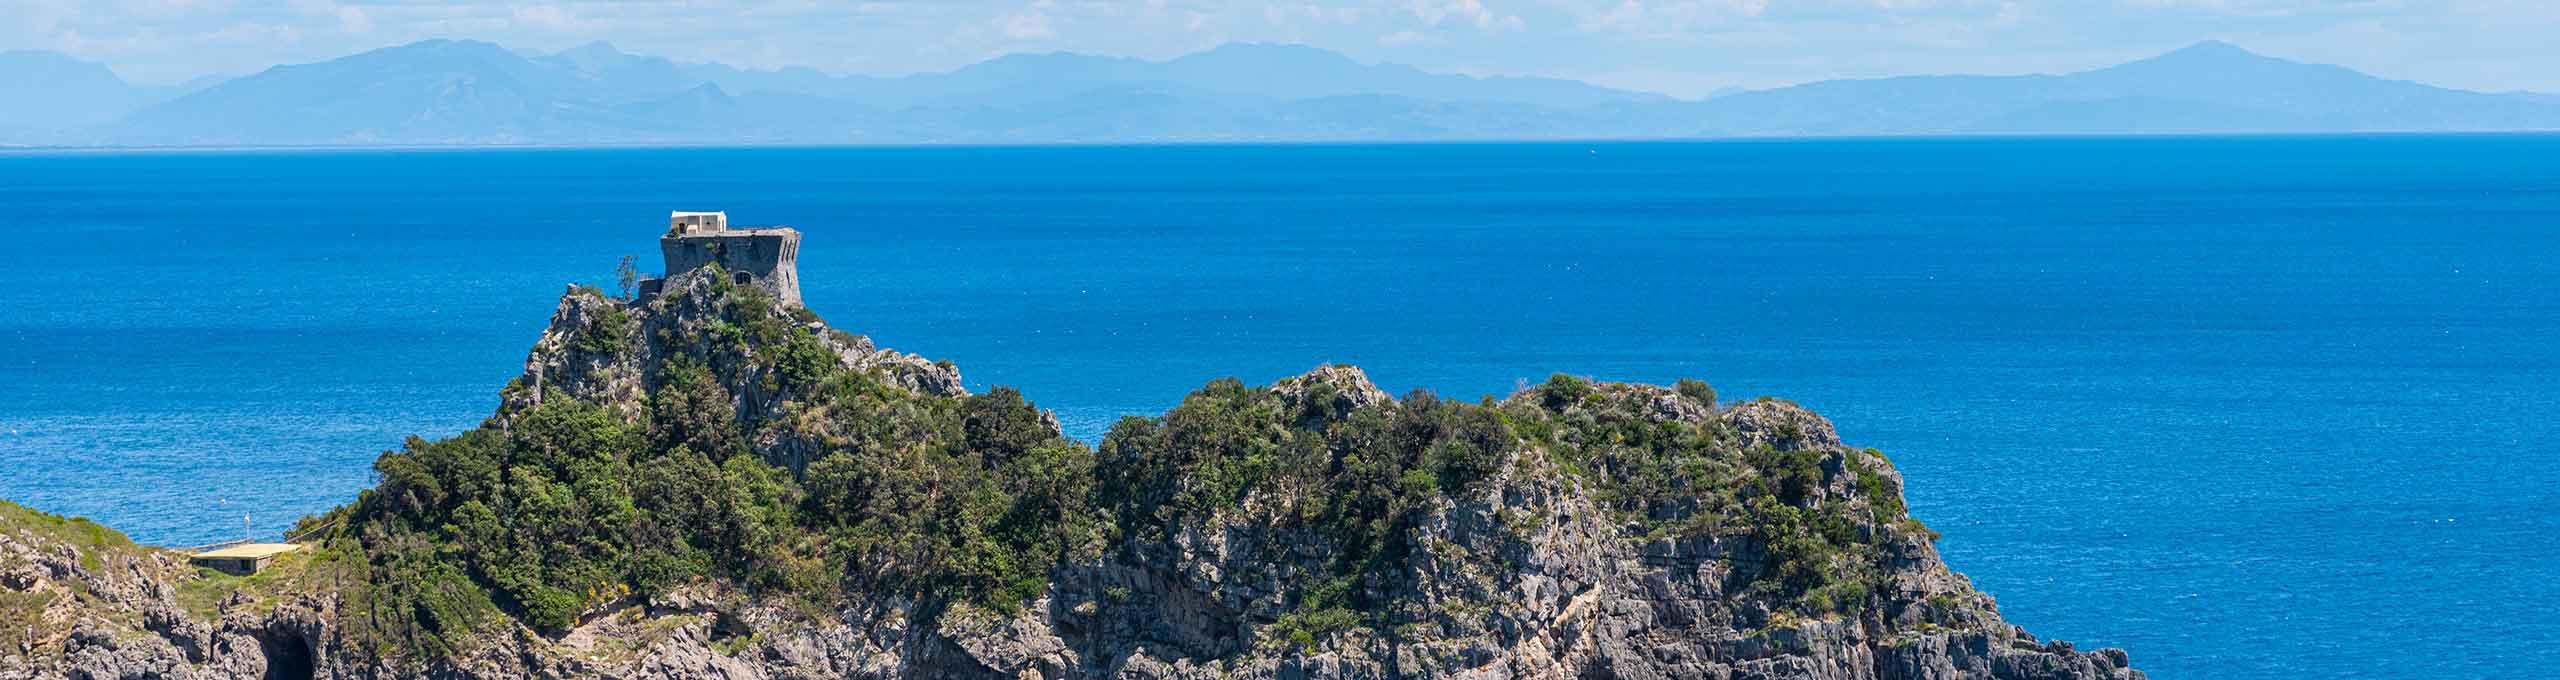 Conca dei Marini, Costiera Amalfitana